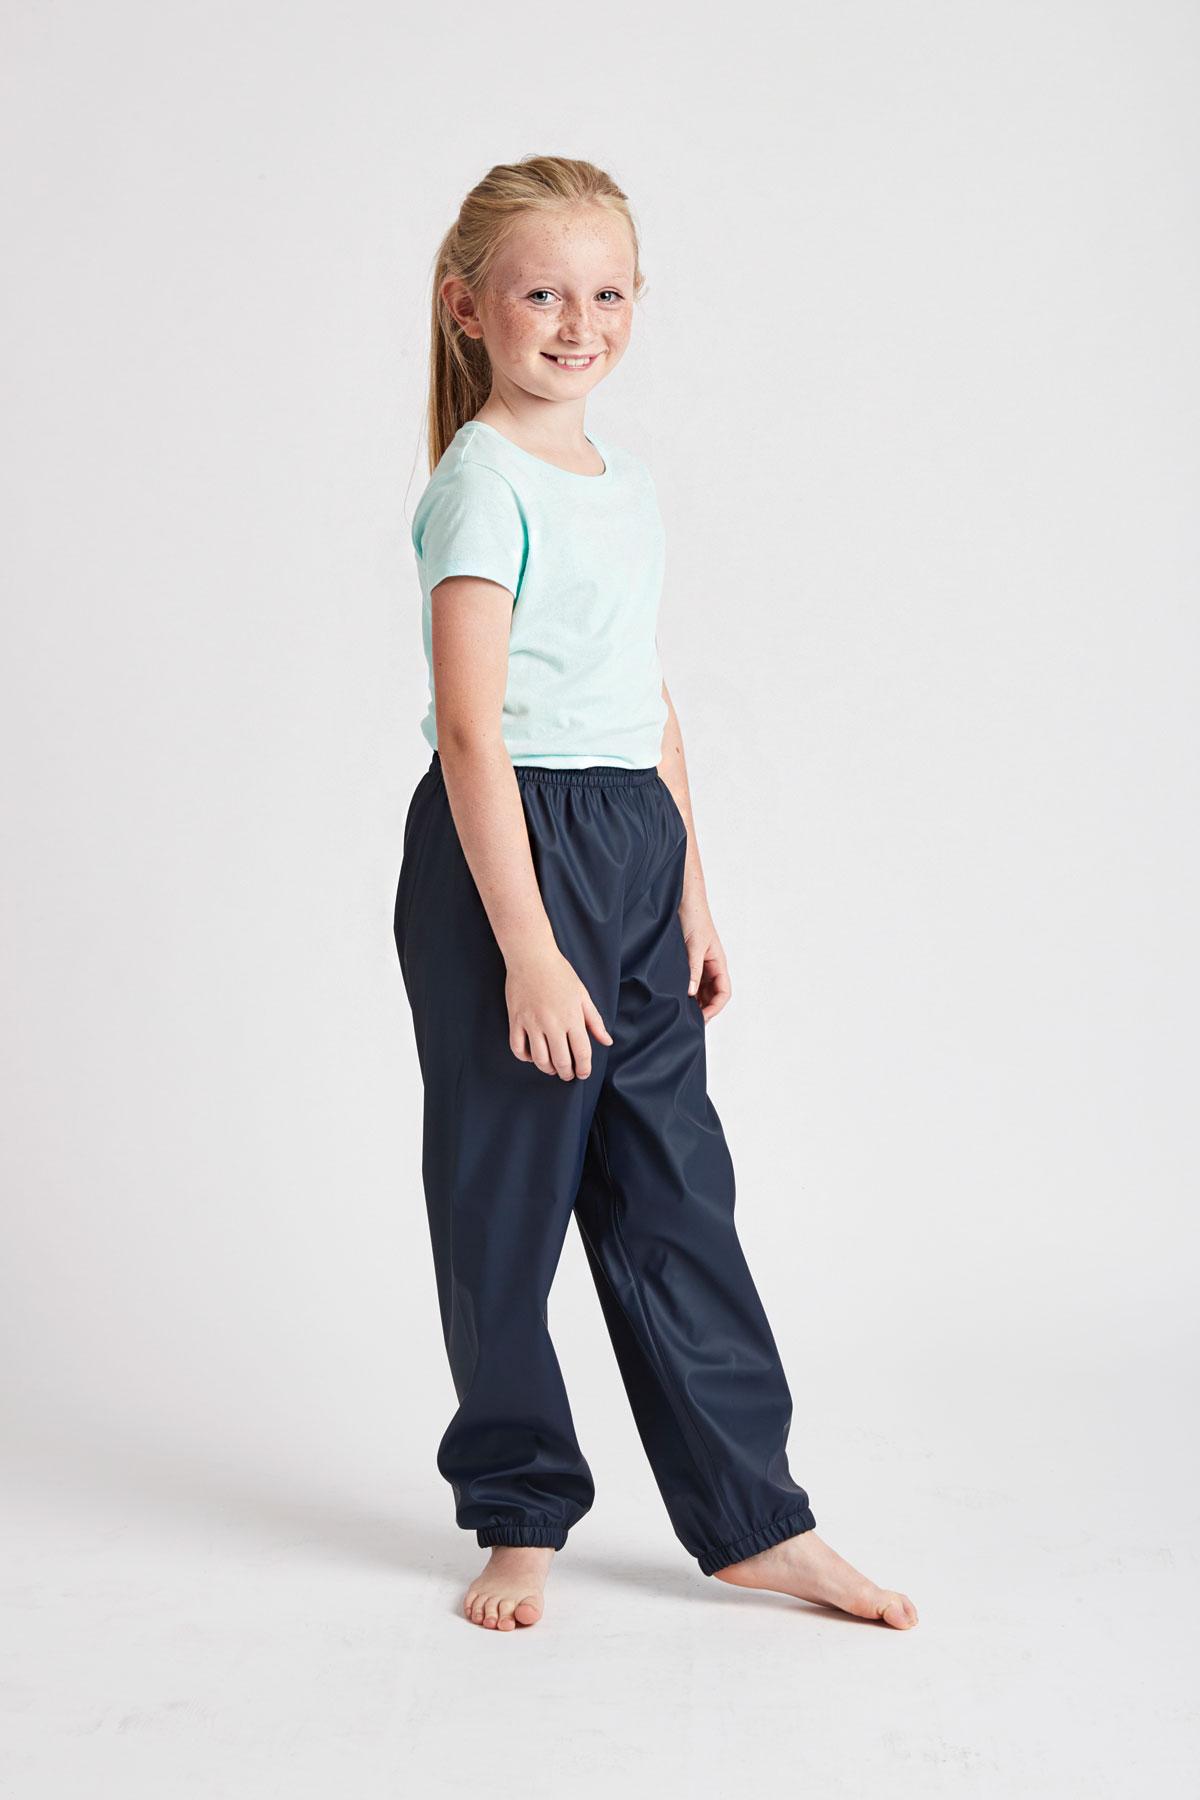 unisex kids waterproof trousers: waterproof navy Rain Runners for girls and boys